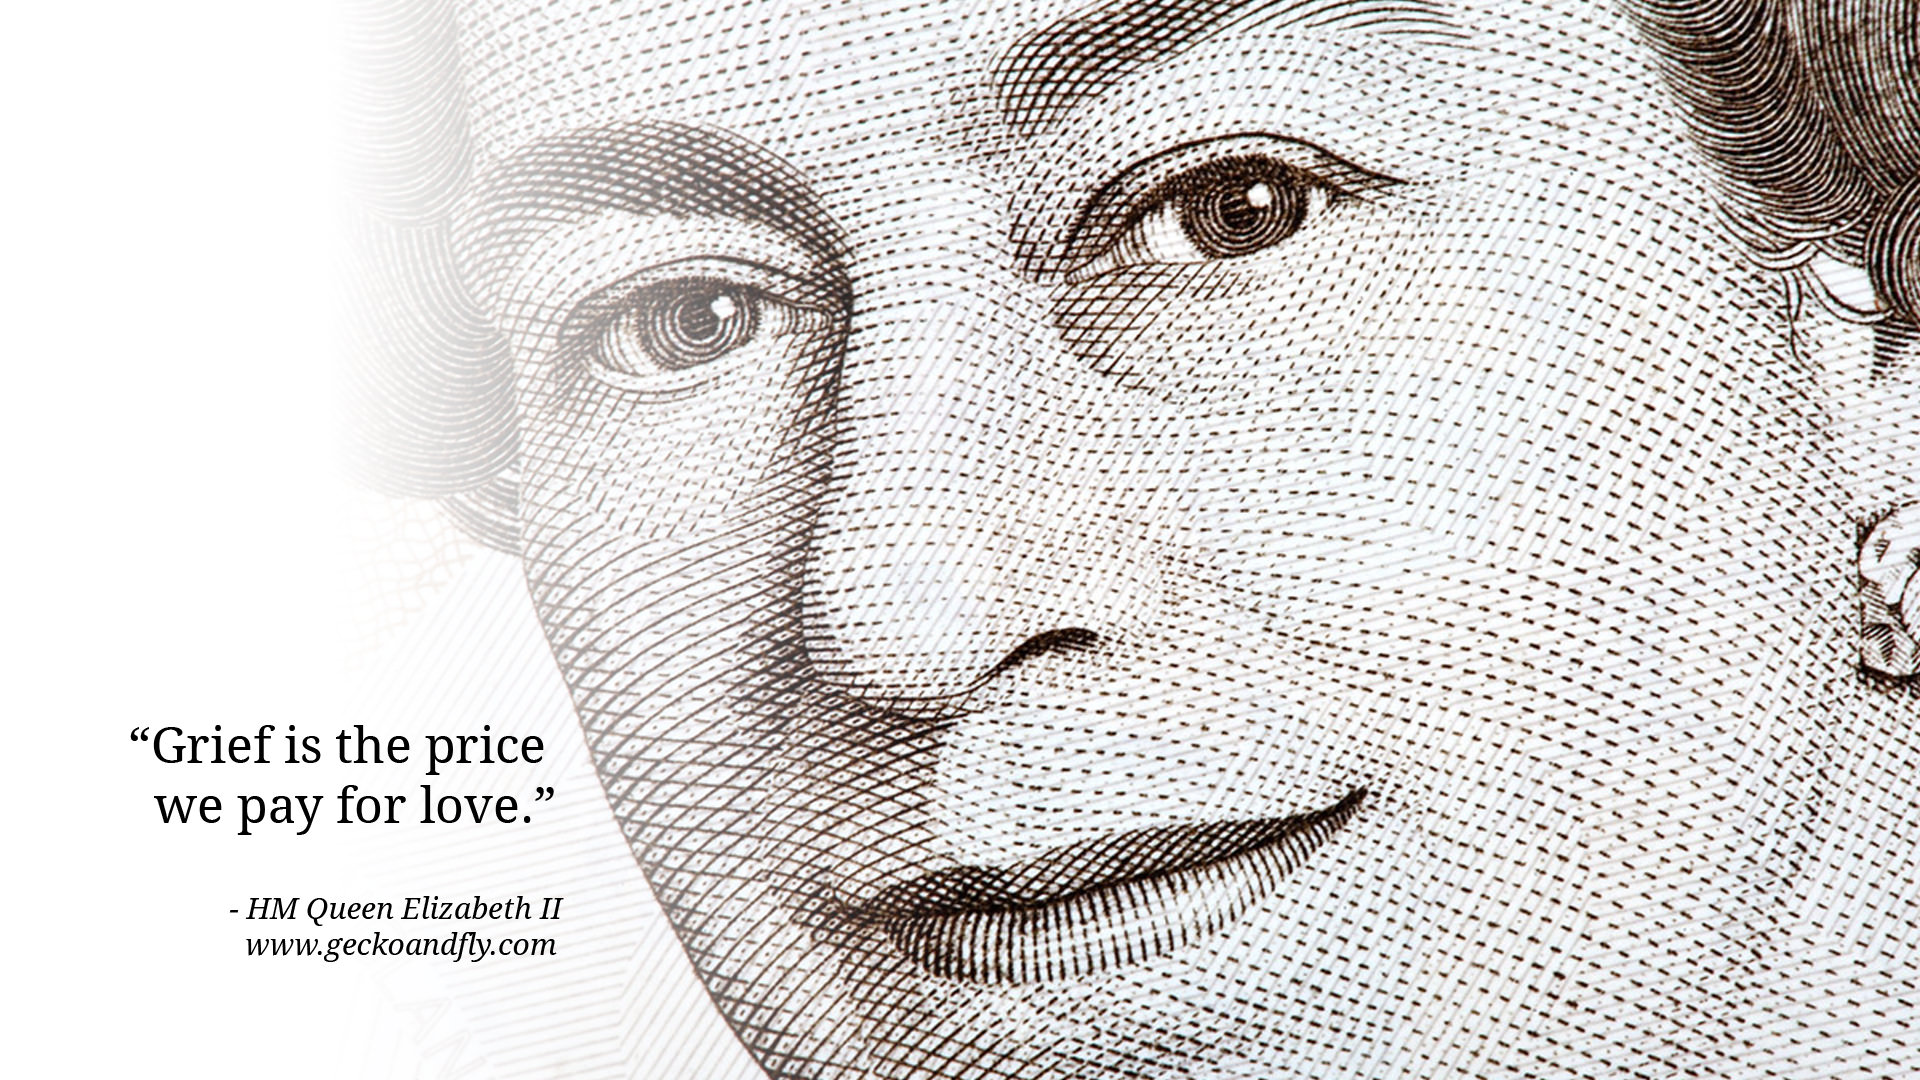 9 Inspiring Queen Elizabeth II Of The United Kingdom Quotes